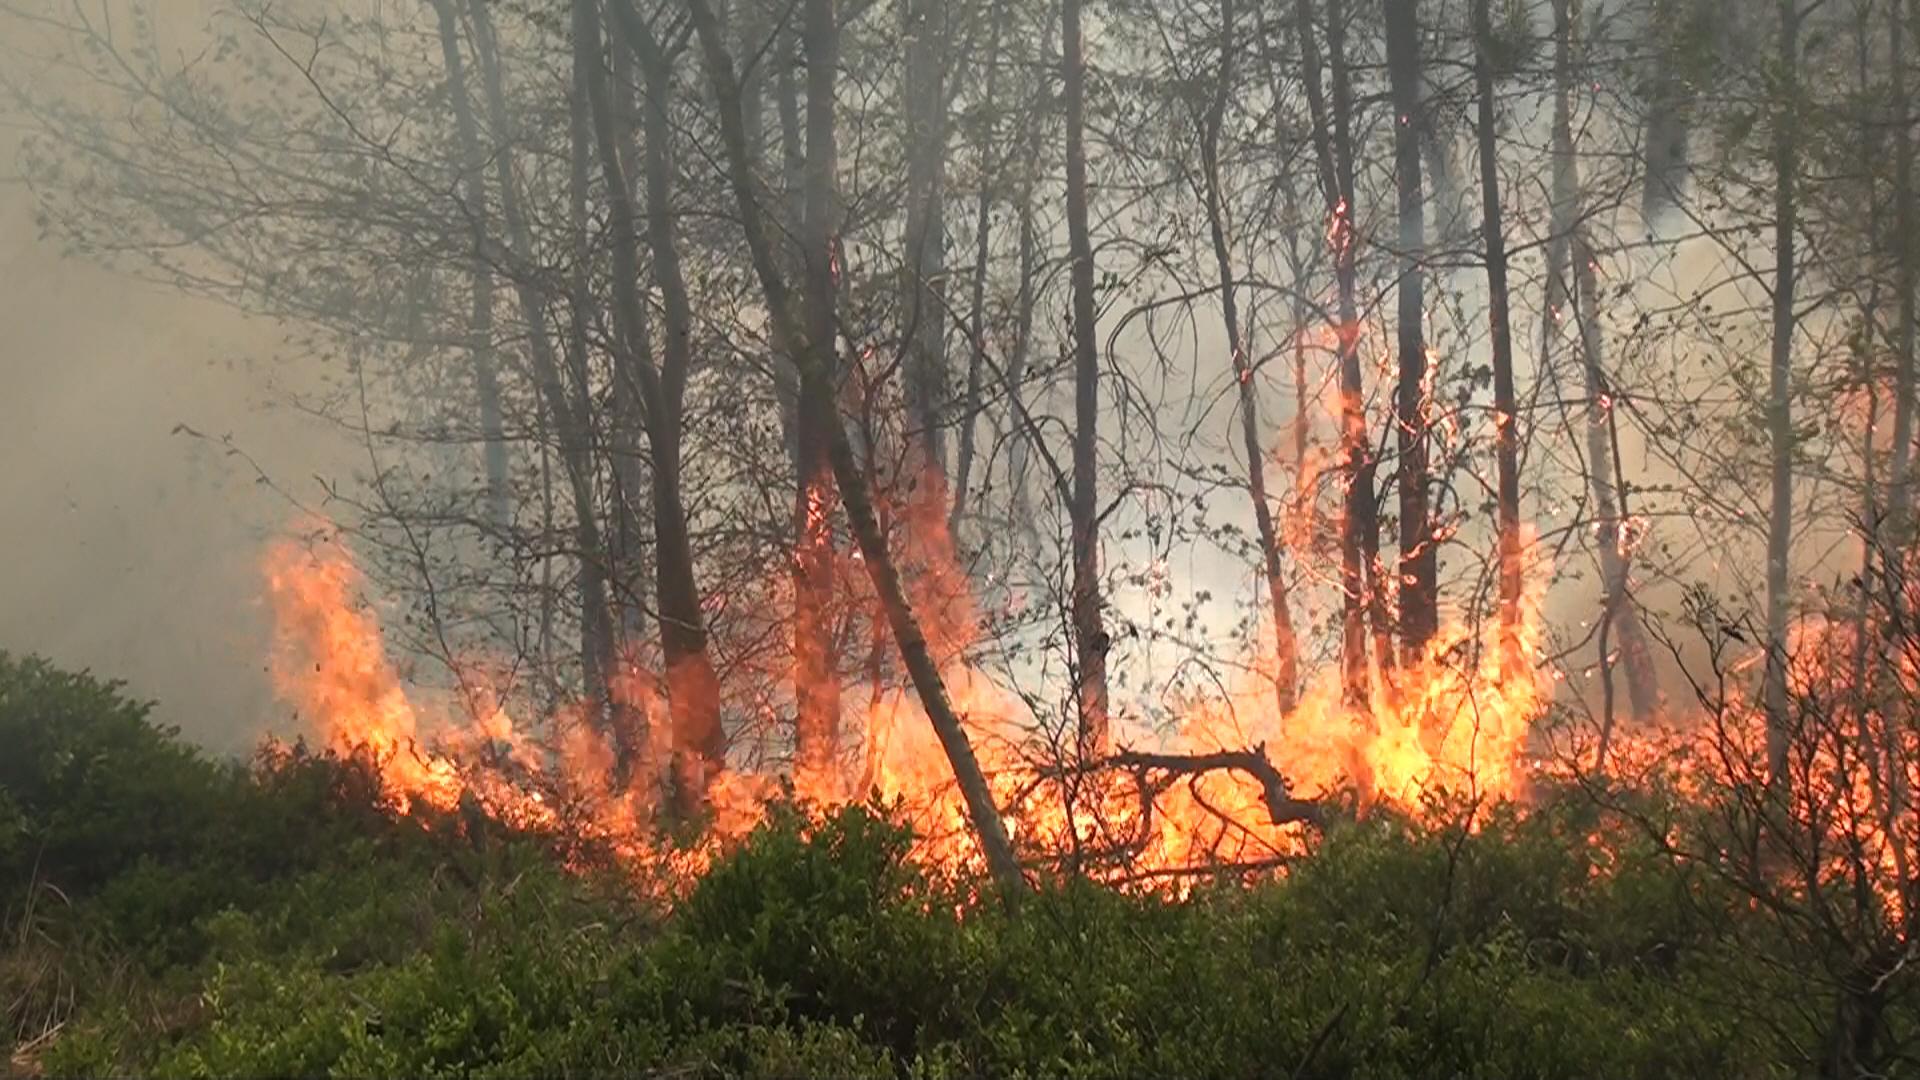 Schweden Waldbrände Karte.Verheerende Waldbrände In Schweden 2018 News Wetter24 De